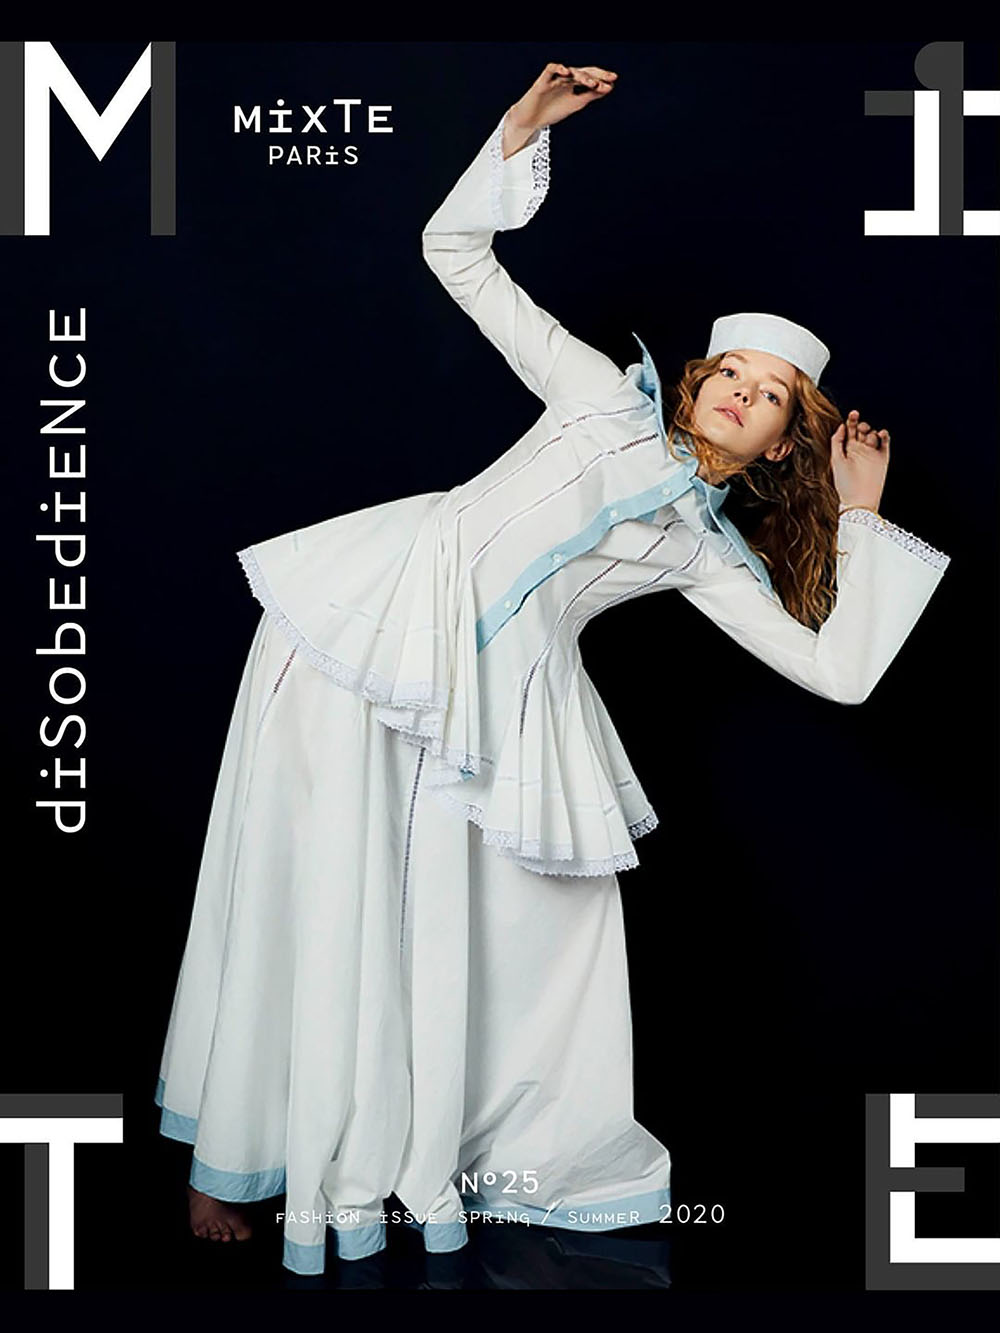 Eliza Kallmann covers Mixte Magazine Spring Summer 2020 by Greg Lin Jiajie